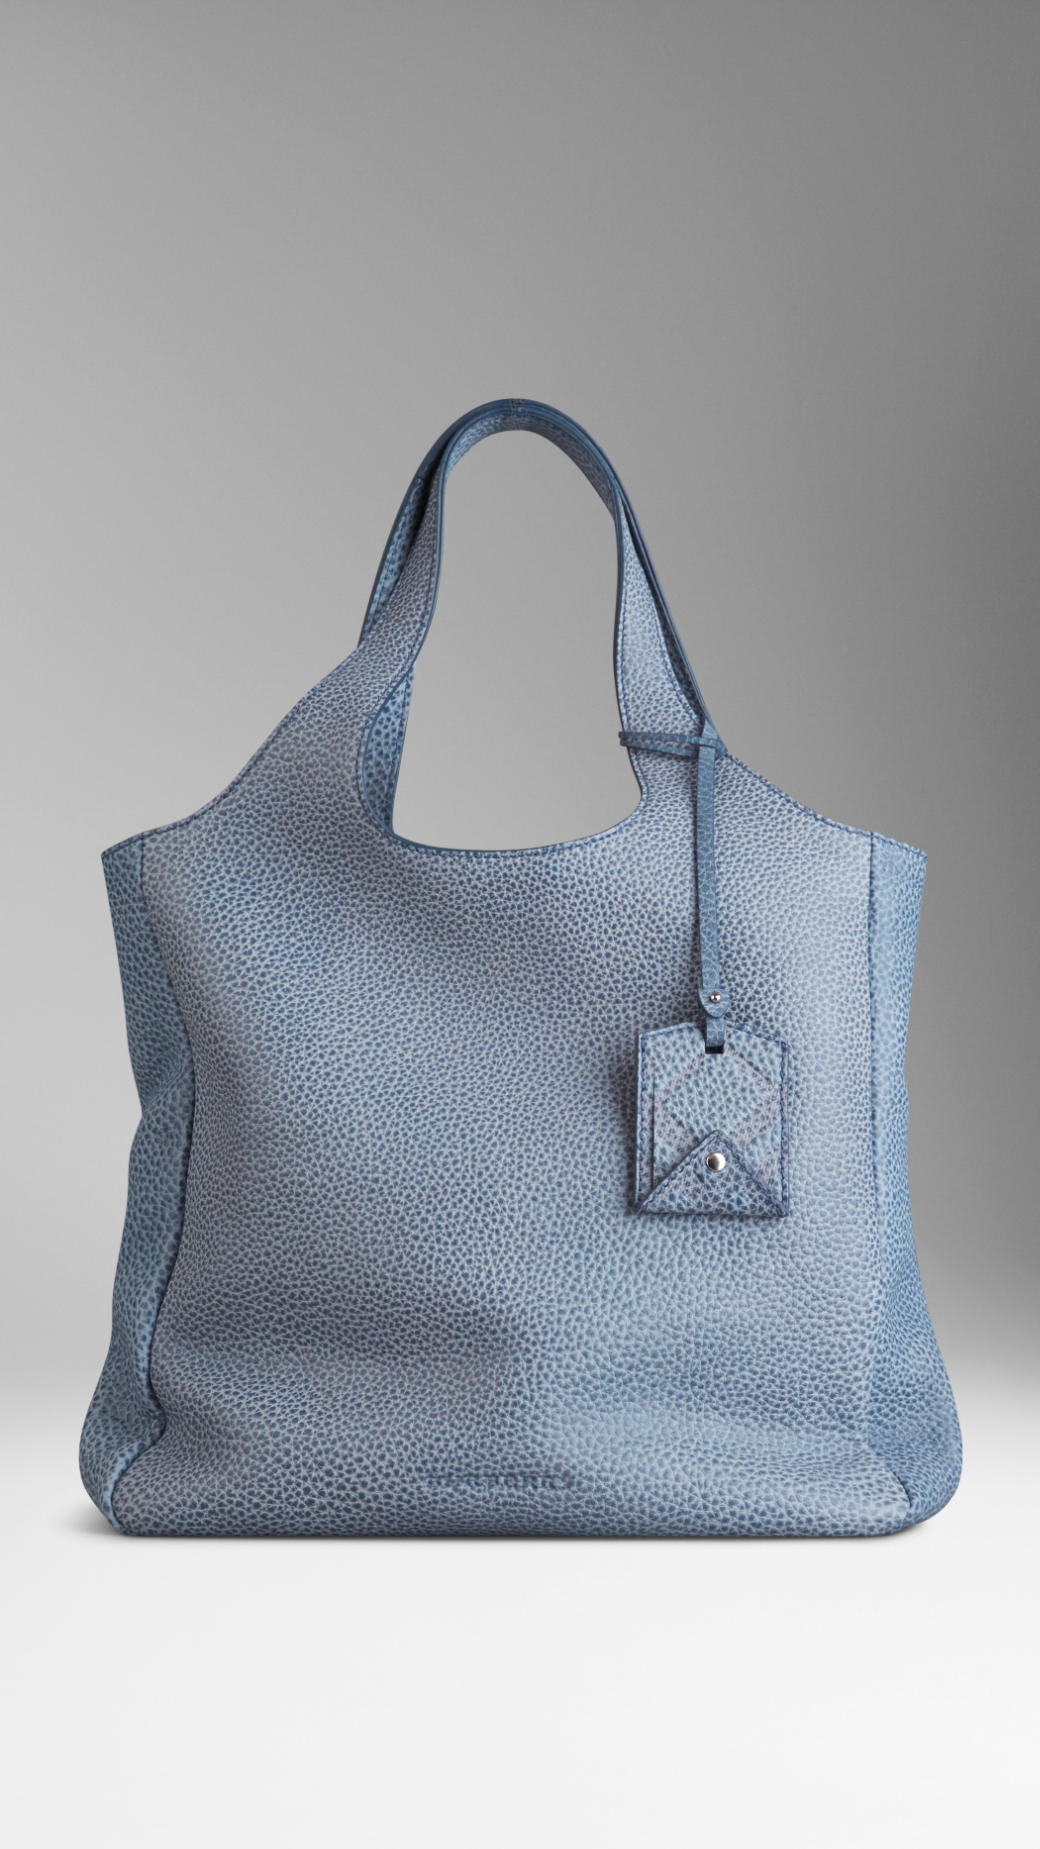 Lyst - Burberry Twotone Grainy Leather Shopper in Blue c707e14f6c04a